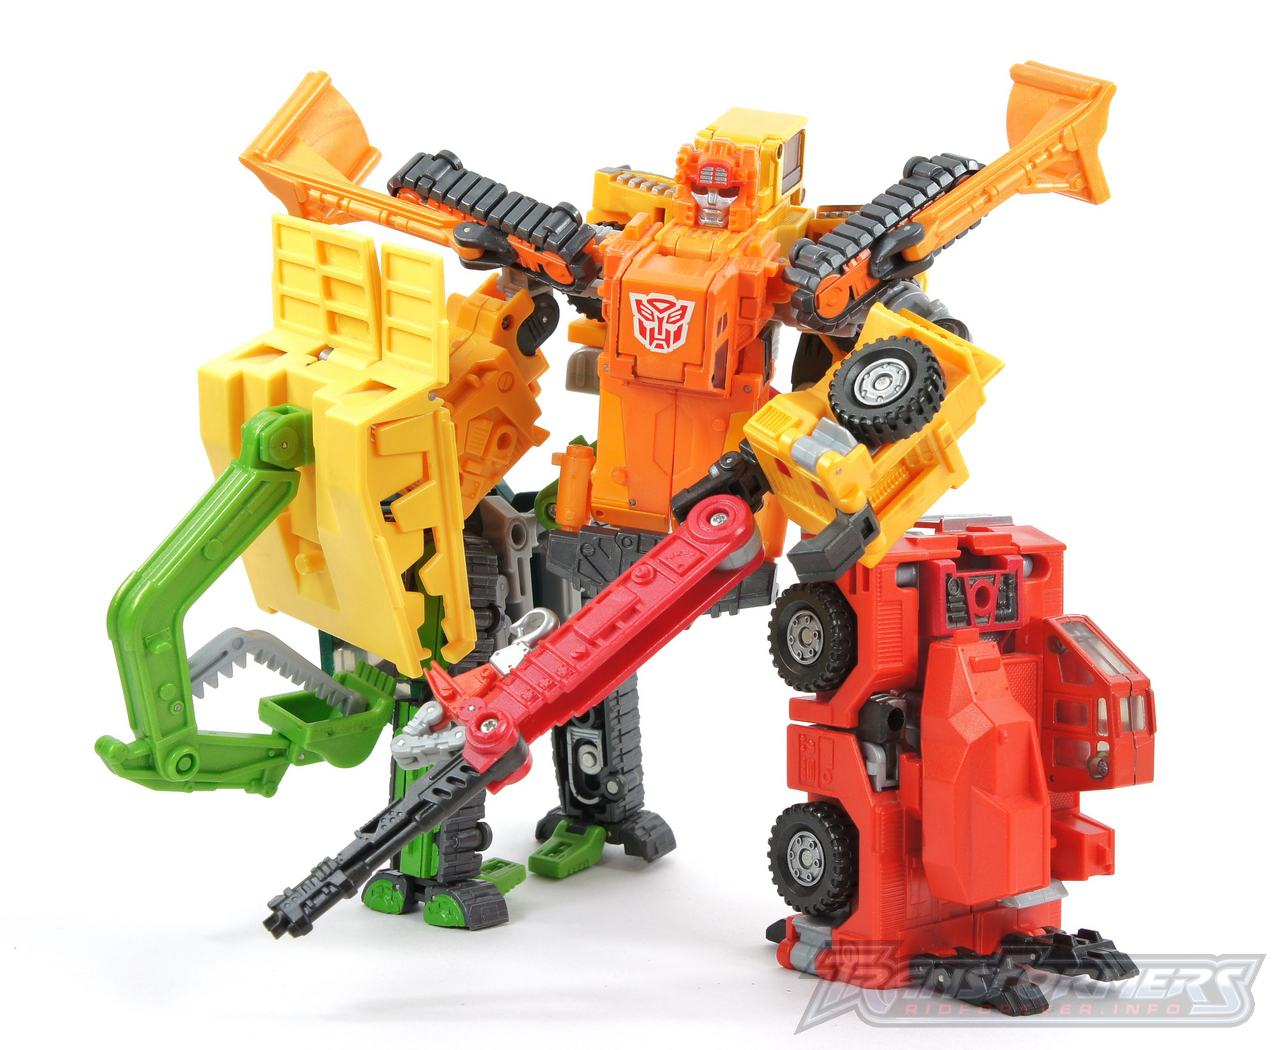 Build King 008